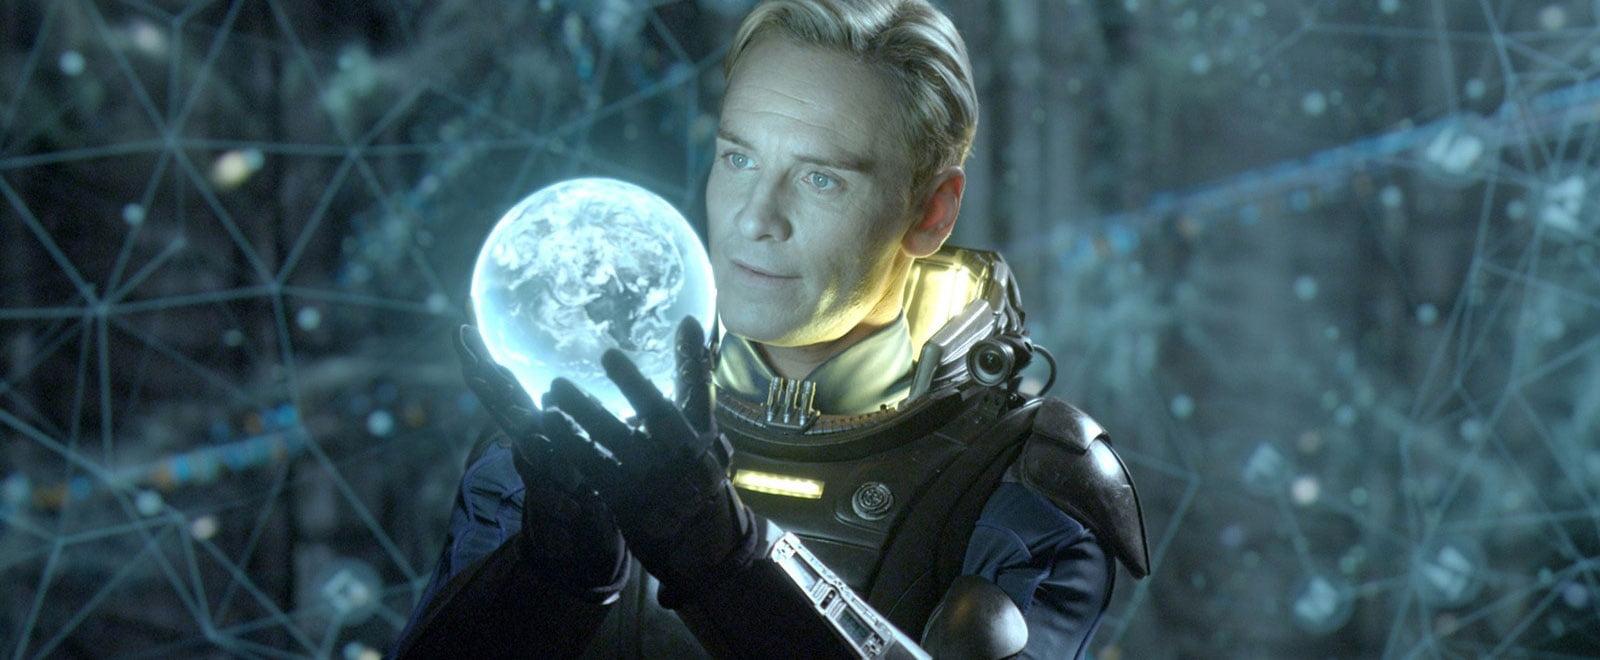 Майкл Фассбендер | Чужий: Заповіт / Alien: Covenant (2017)